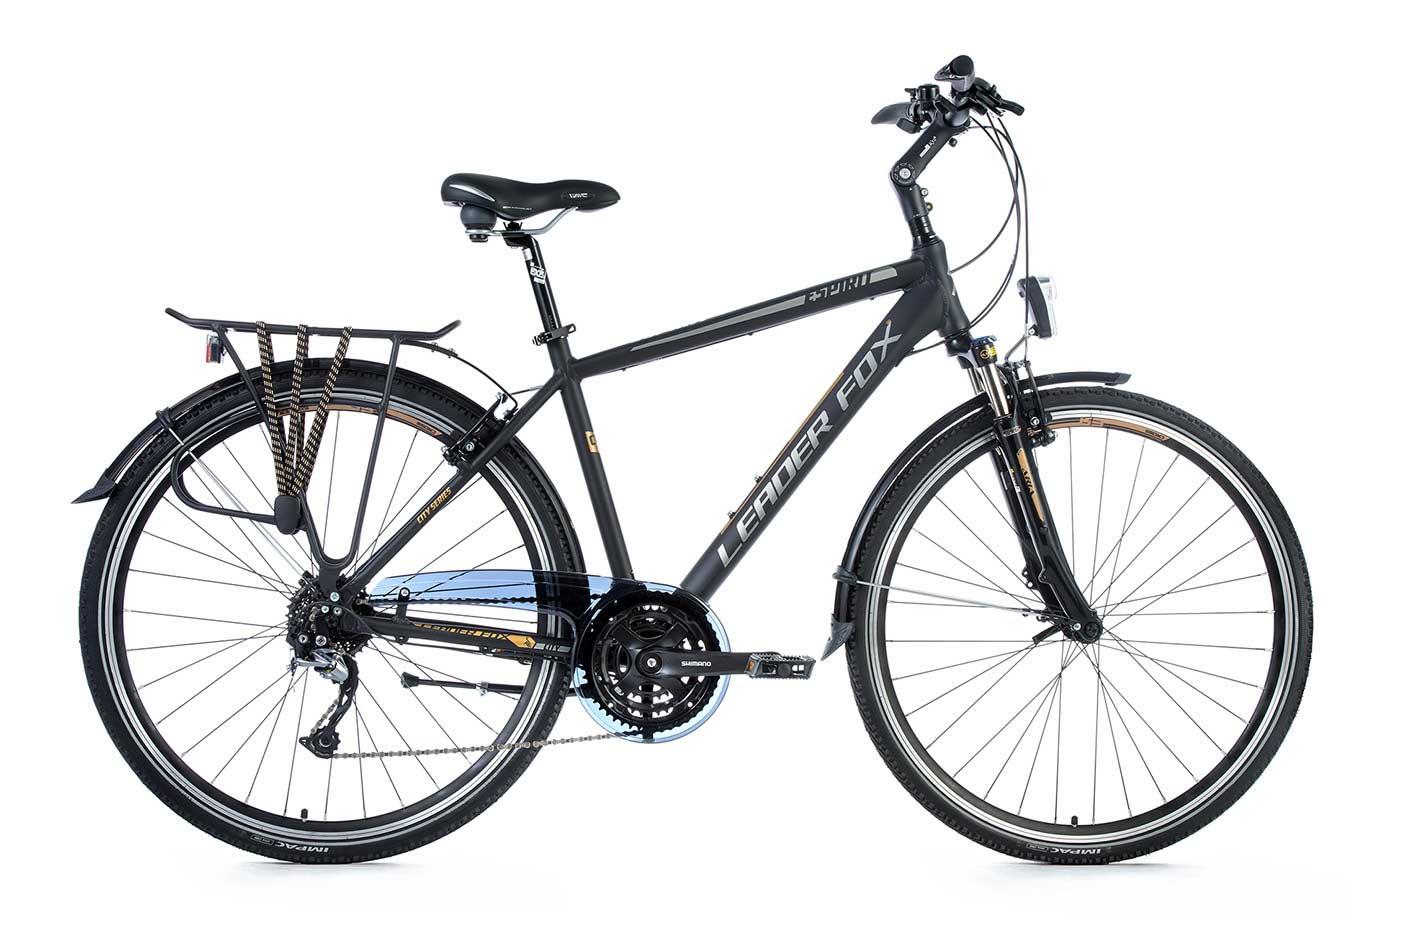 Bicicleta de Oras Leader Fox ESPIRIT Gent 2018